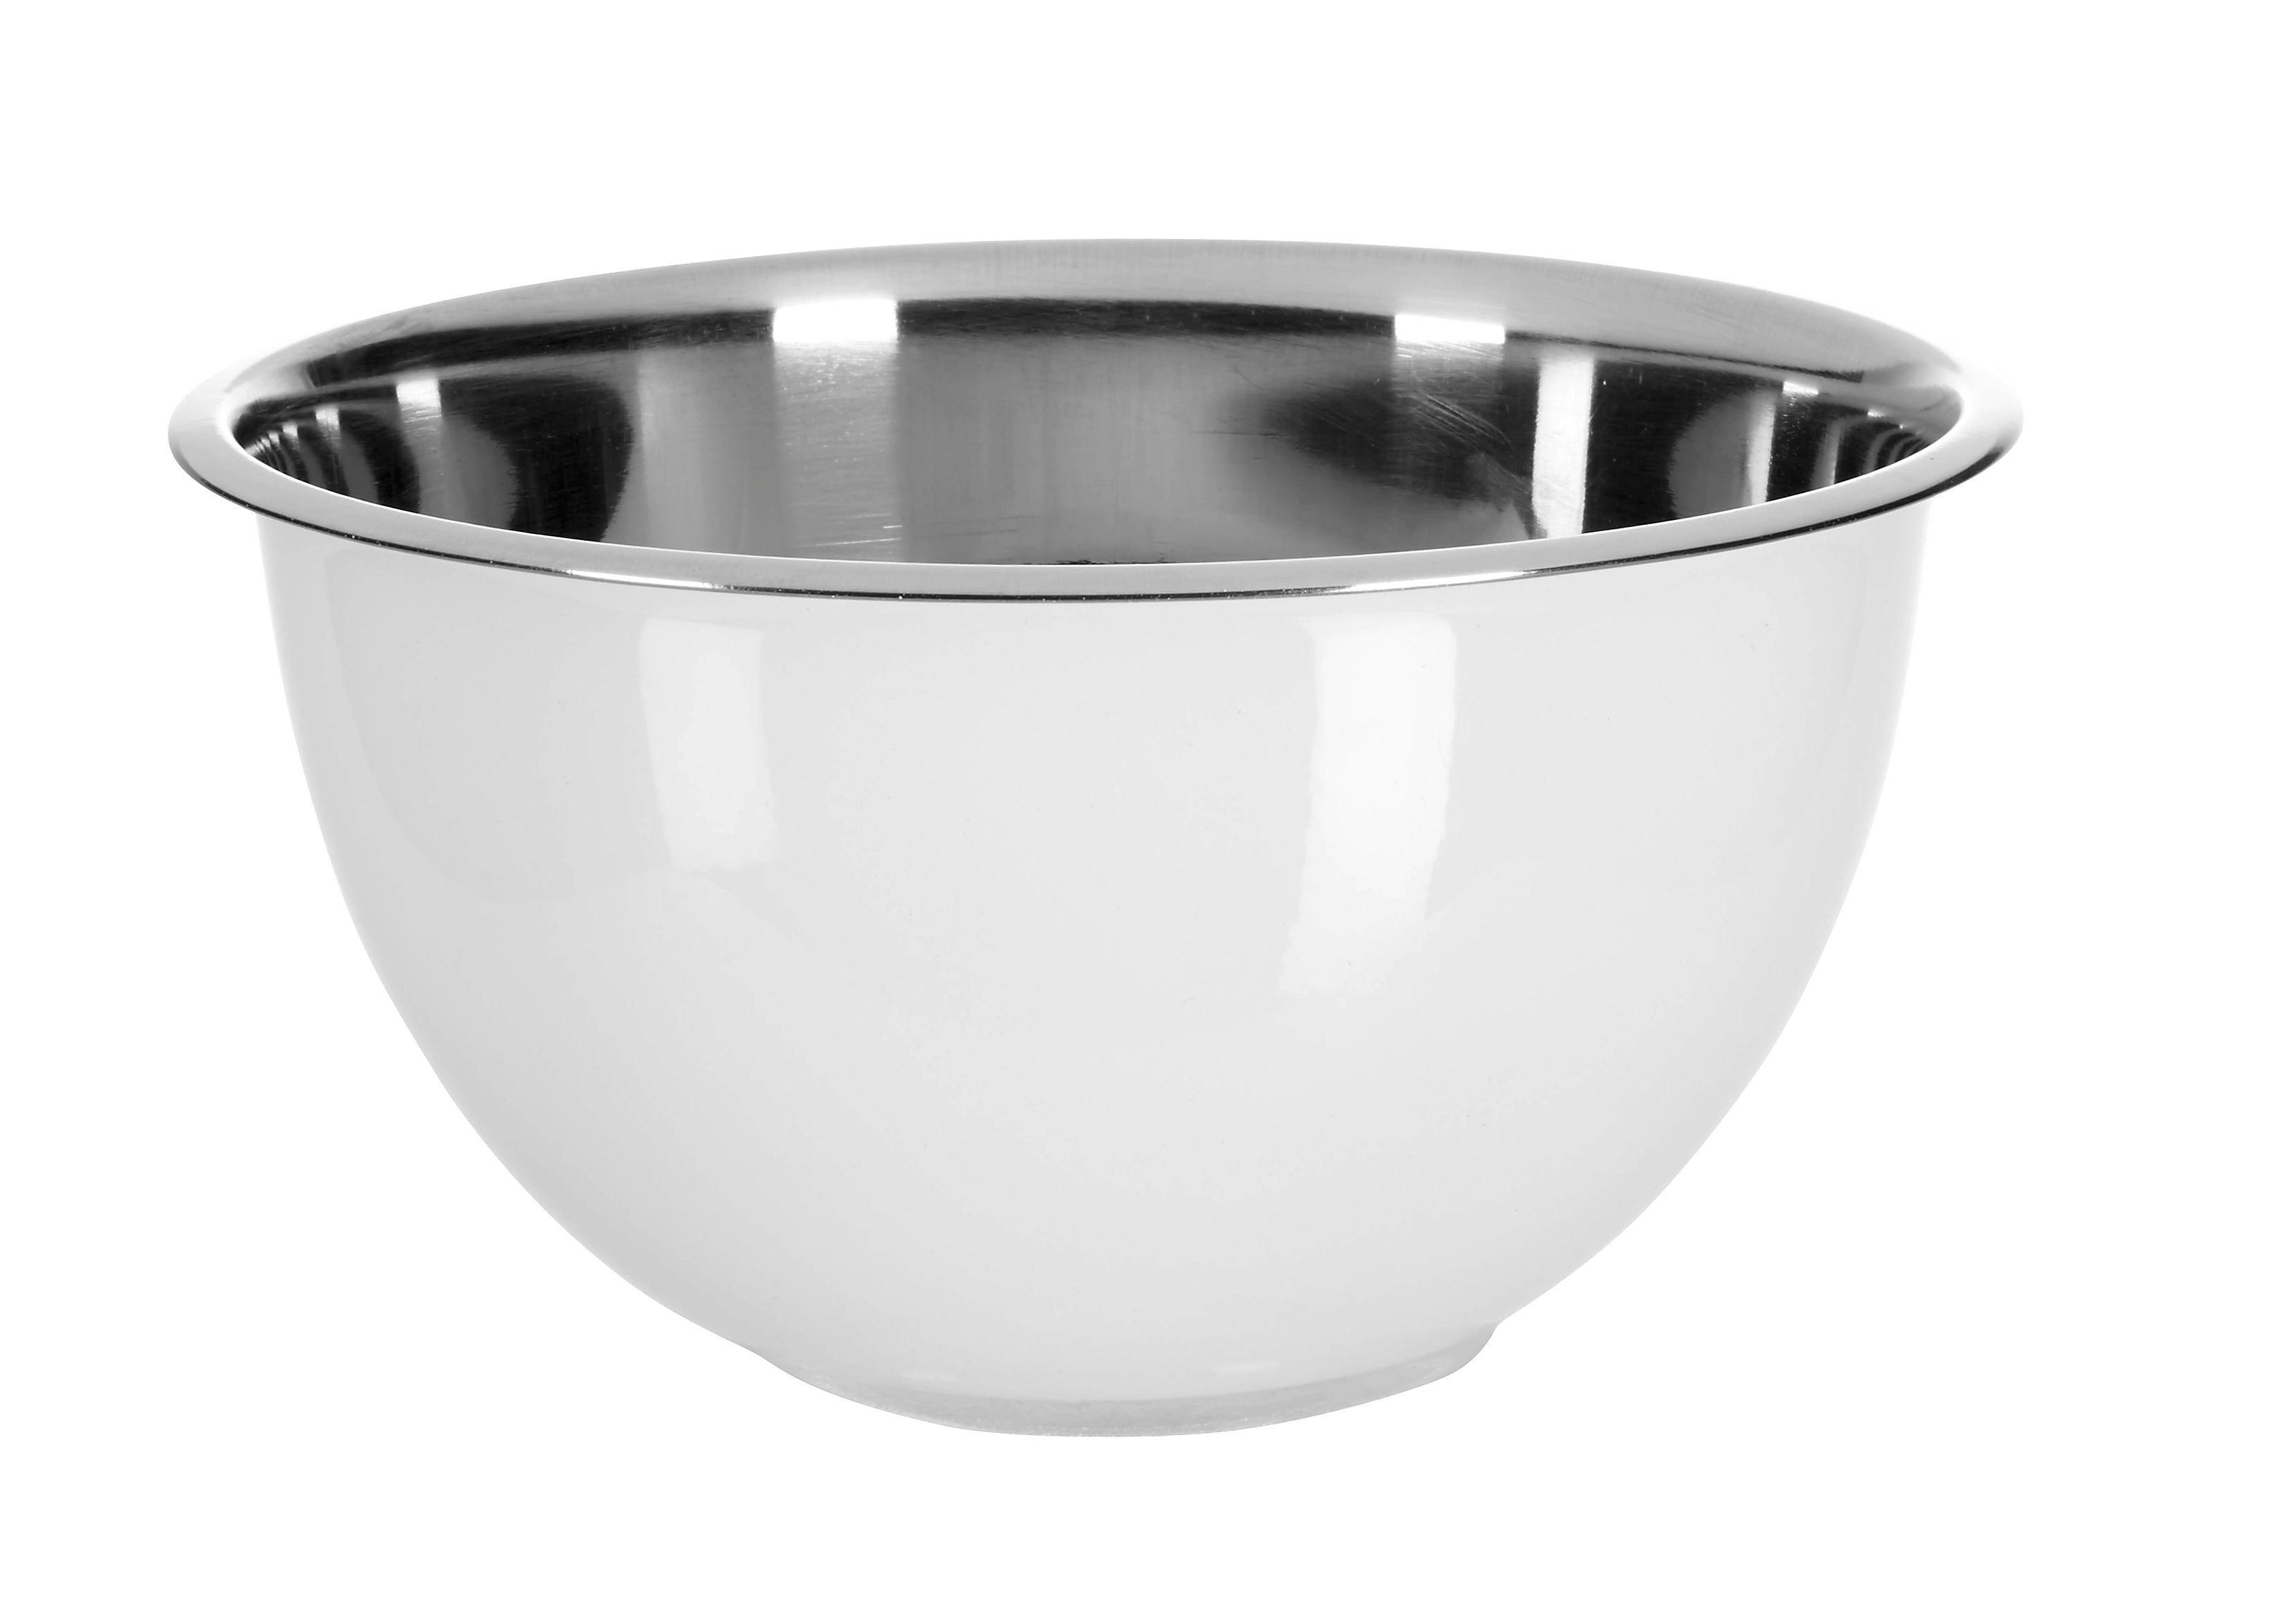 Schüssel Dani in Weiß, Ø ca. 18cm - Edelstahlfarben/Weiß, Metall (18/9,5cm) - MÖMAX modern living